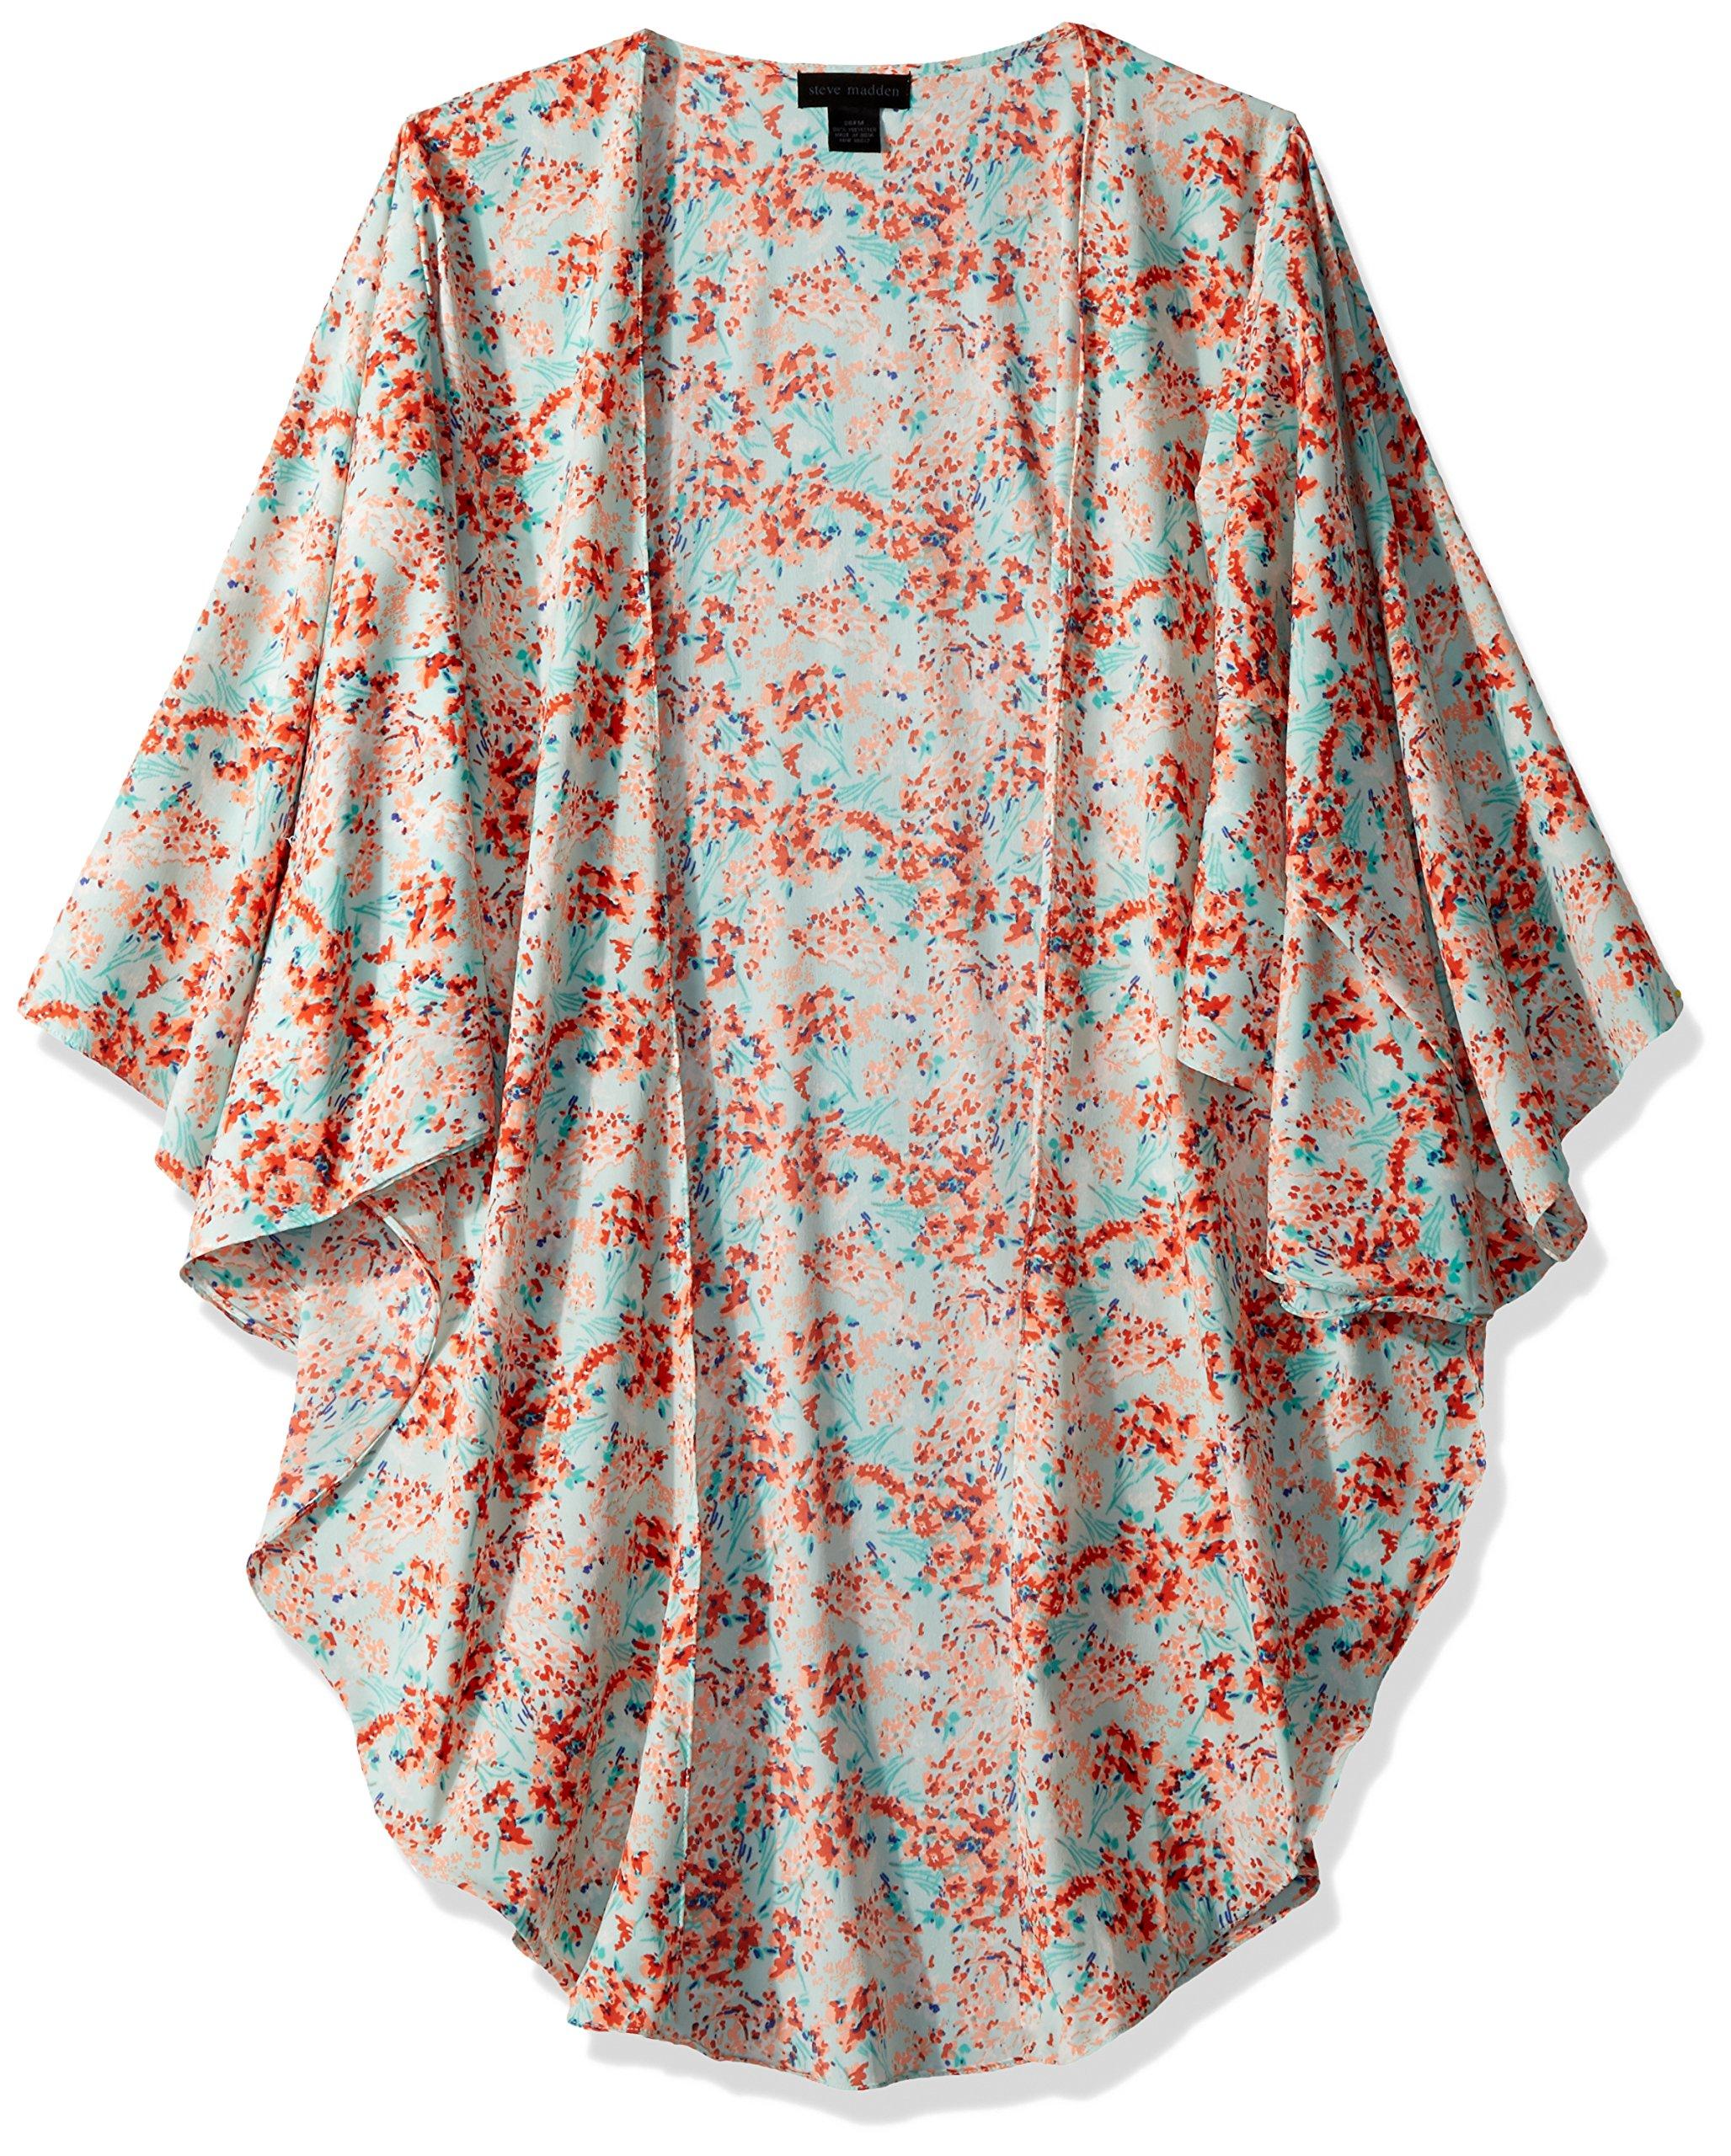 Steve Madden Women's Spring Breeze LUX Kimono Accessory, Seafoam, One Size by Steve Madden